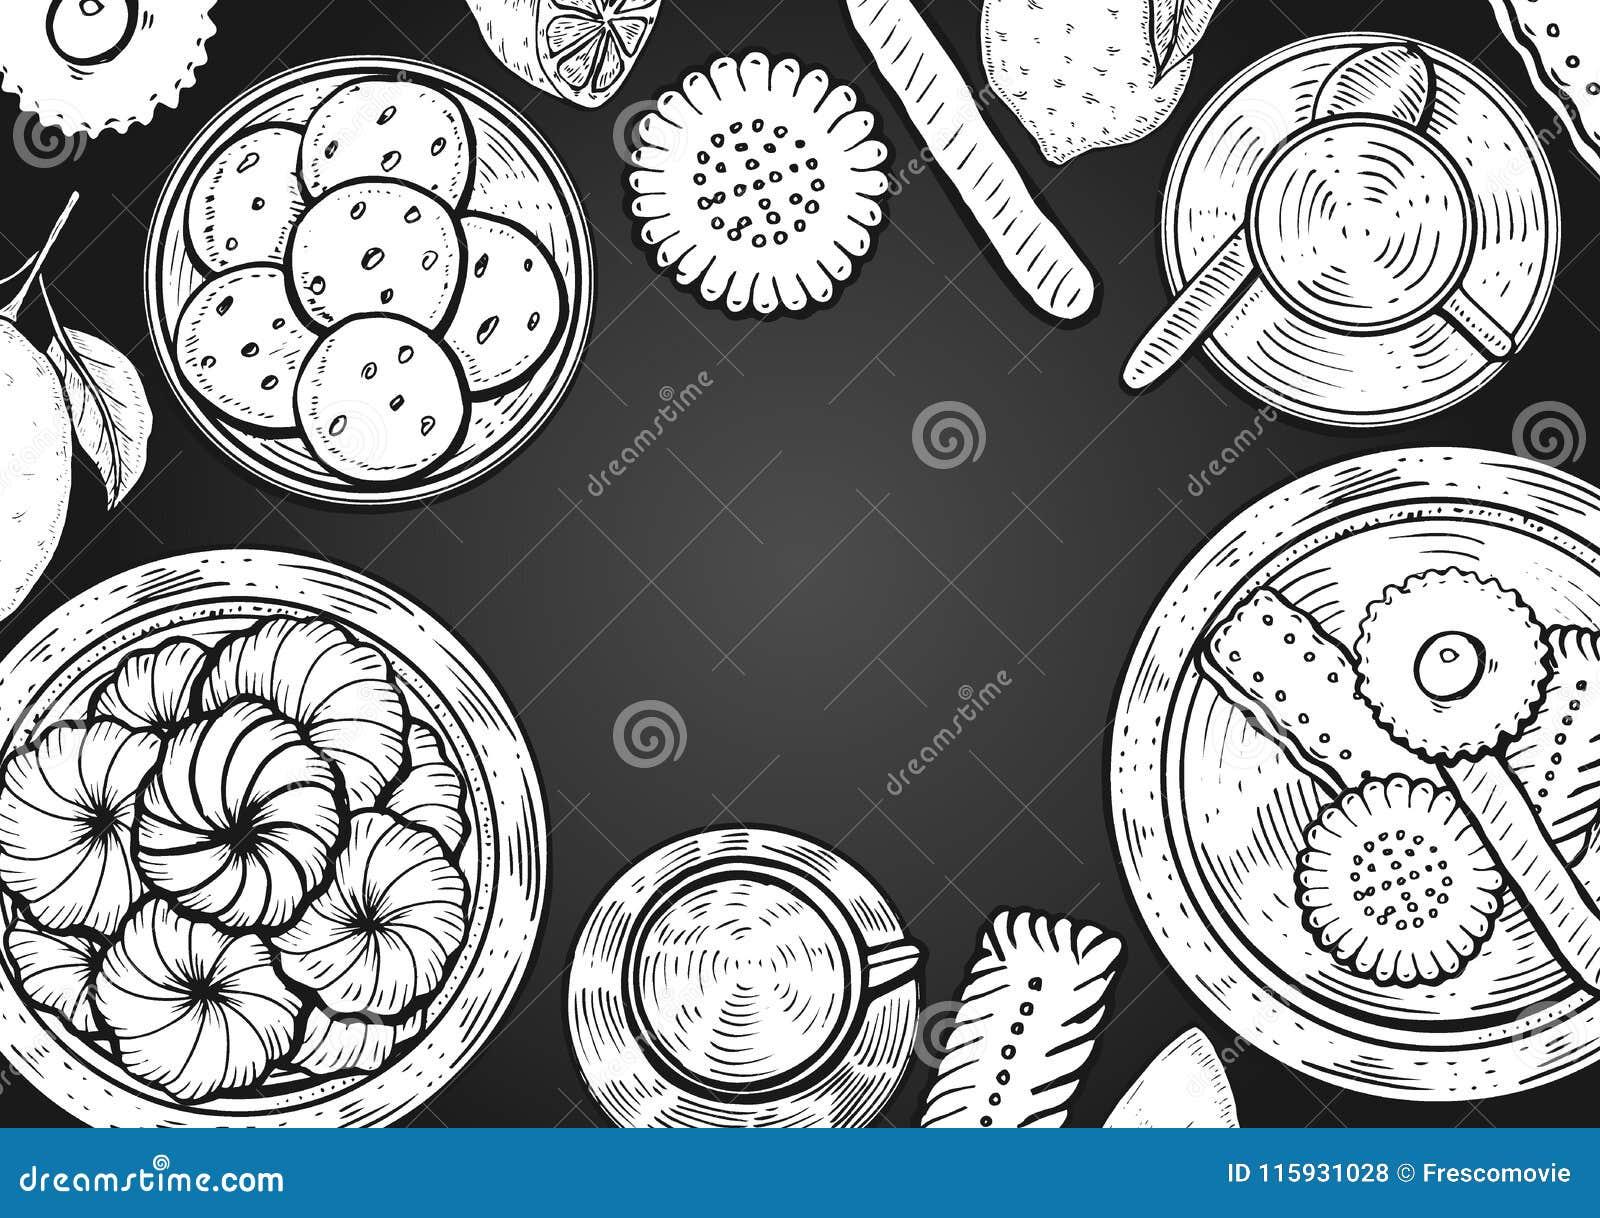 Oriental Sweets Illustration Stock Vector Illustration Of